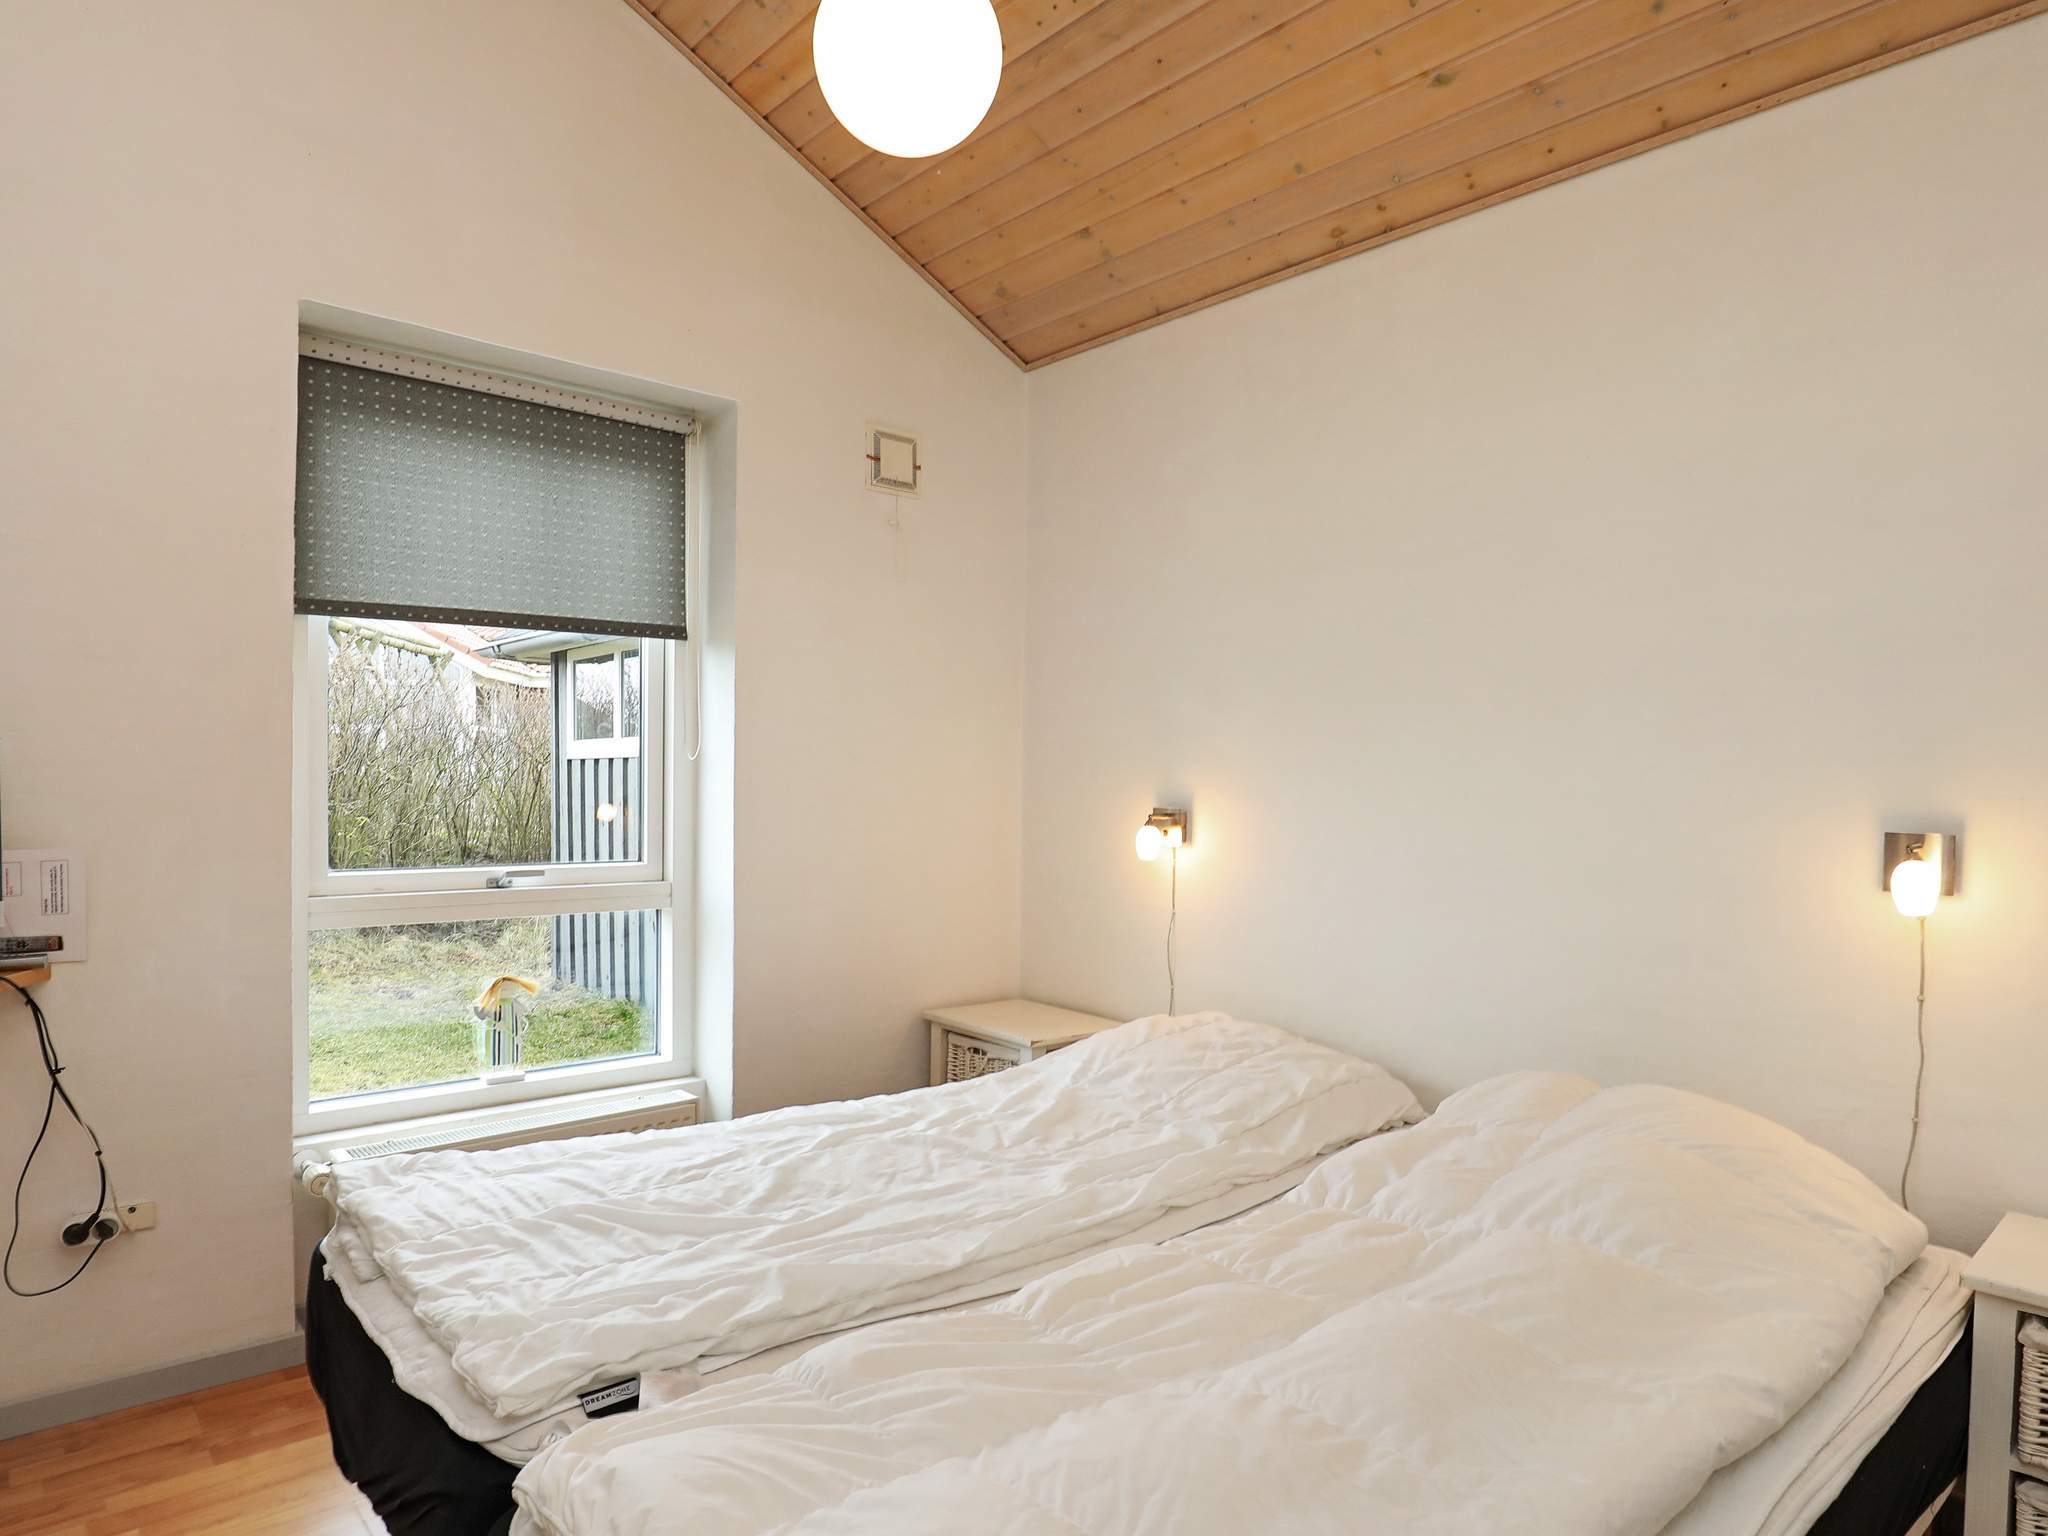 Ferienhaus Haurvig (125276), Hvide Sande, , Westjütland, Dänemark, Bild 11